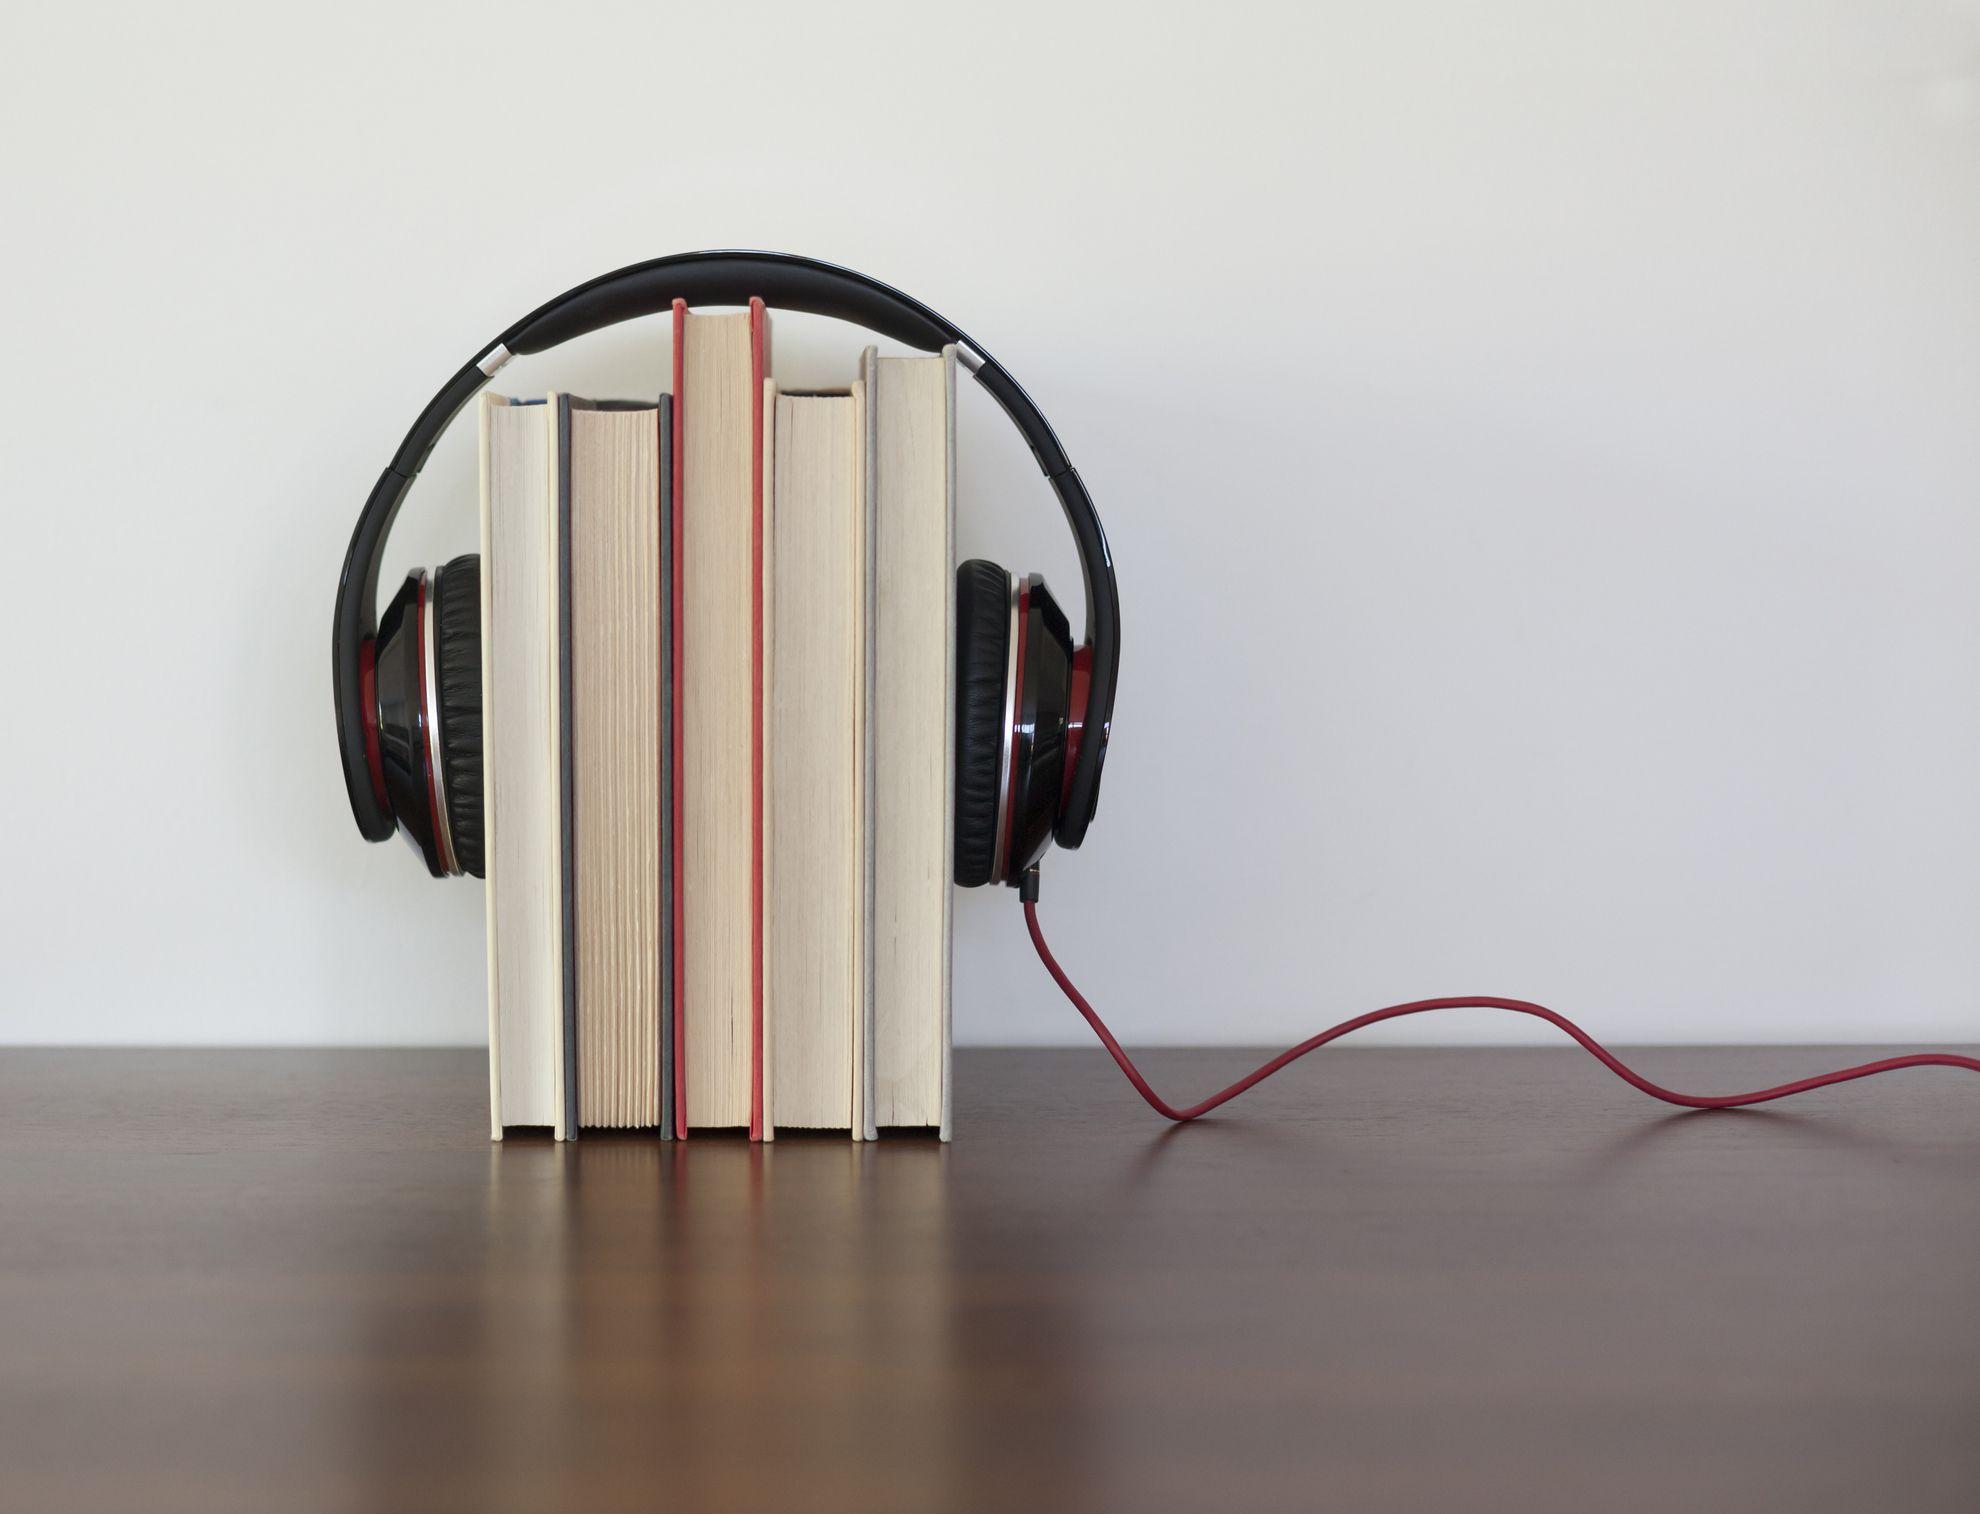 Free audio books for kindergarten casaruraldavina.com